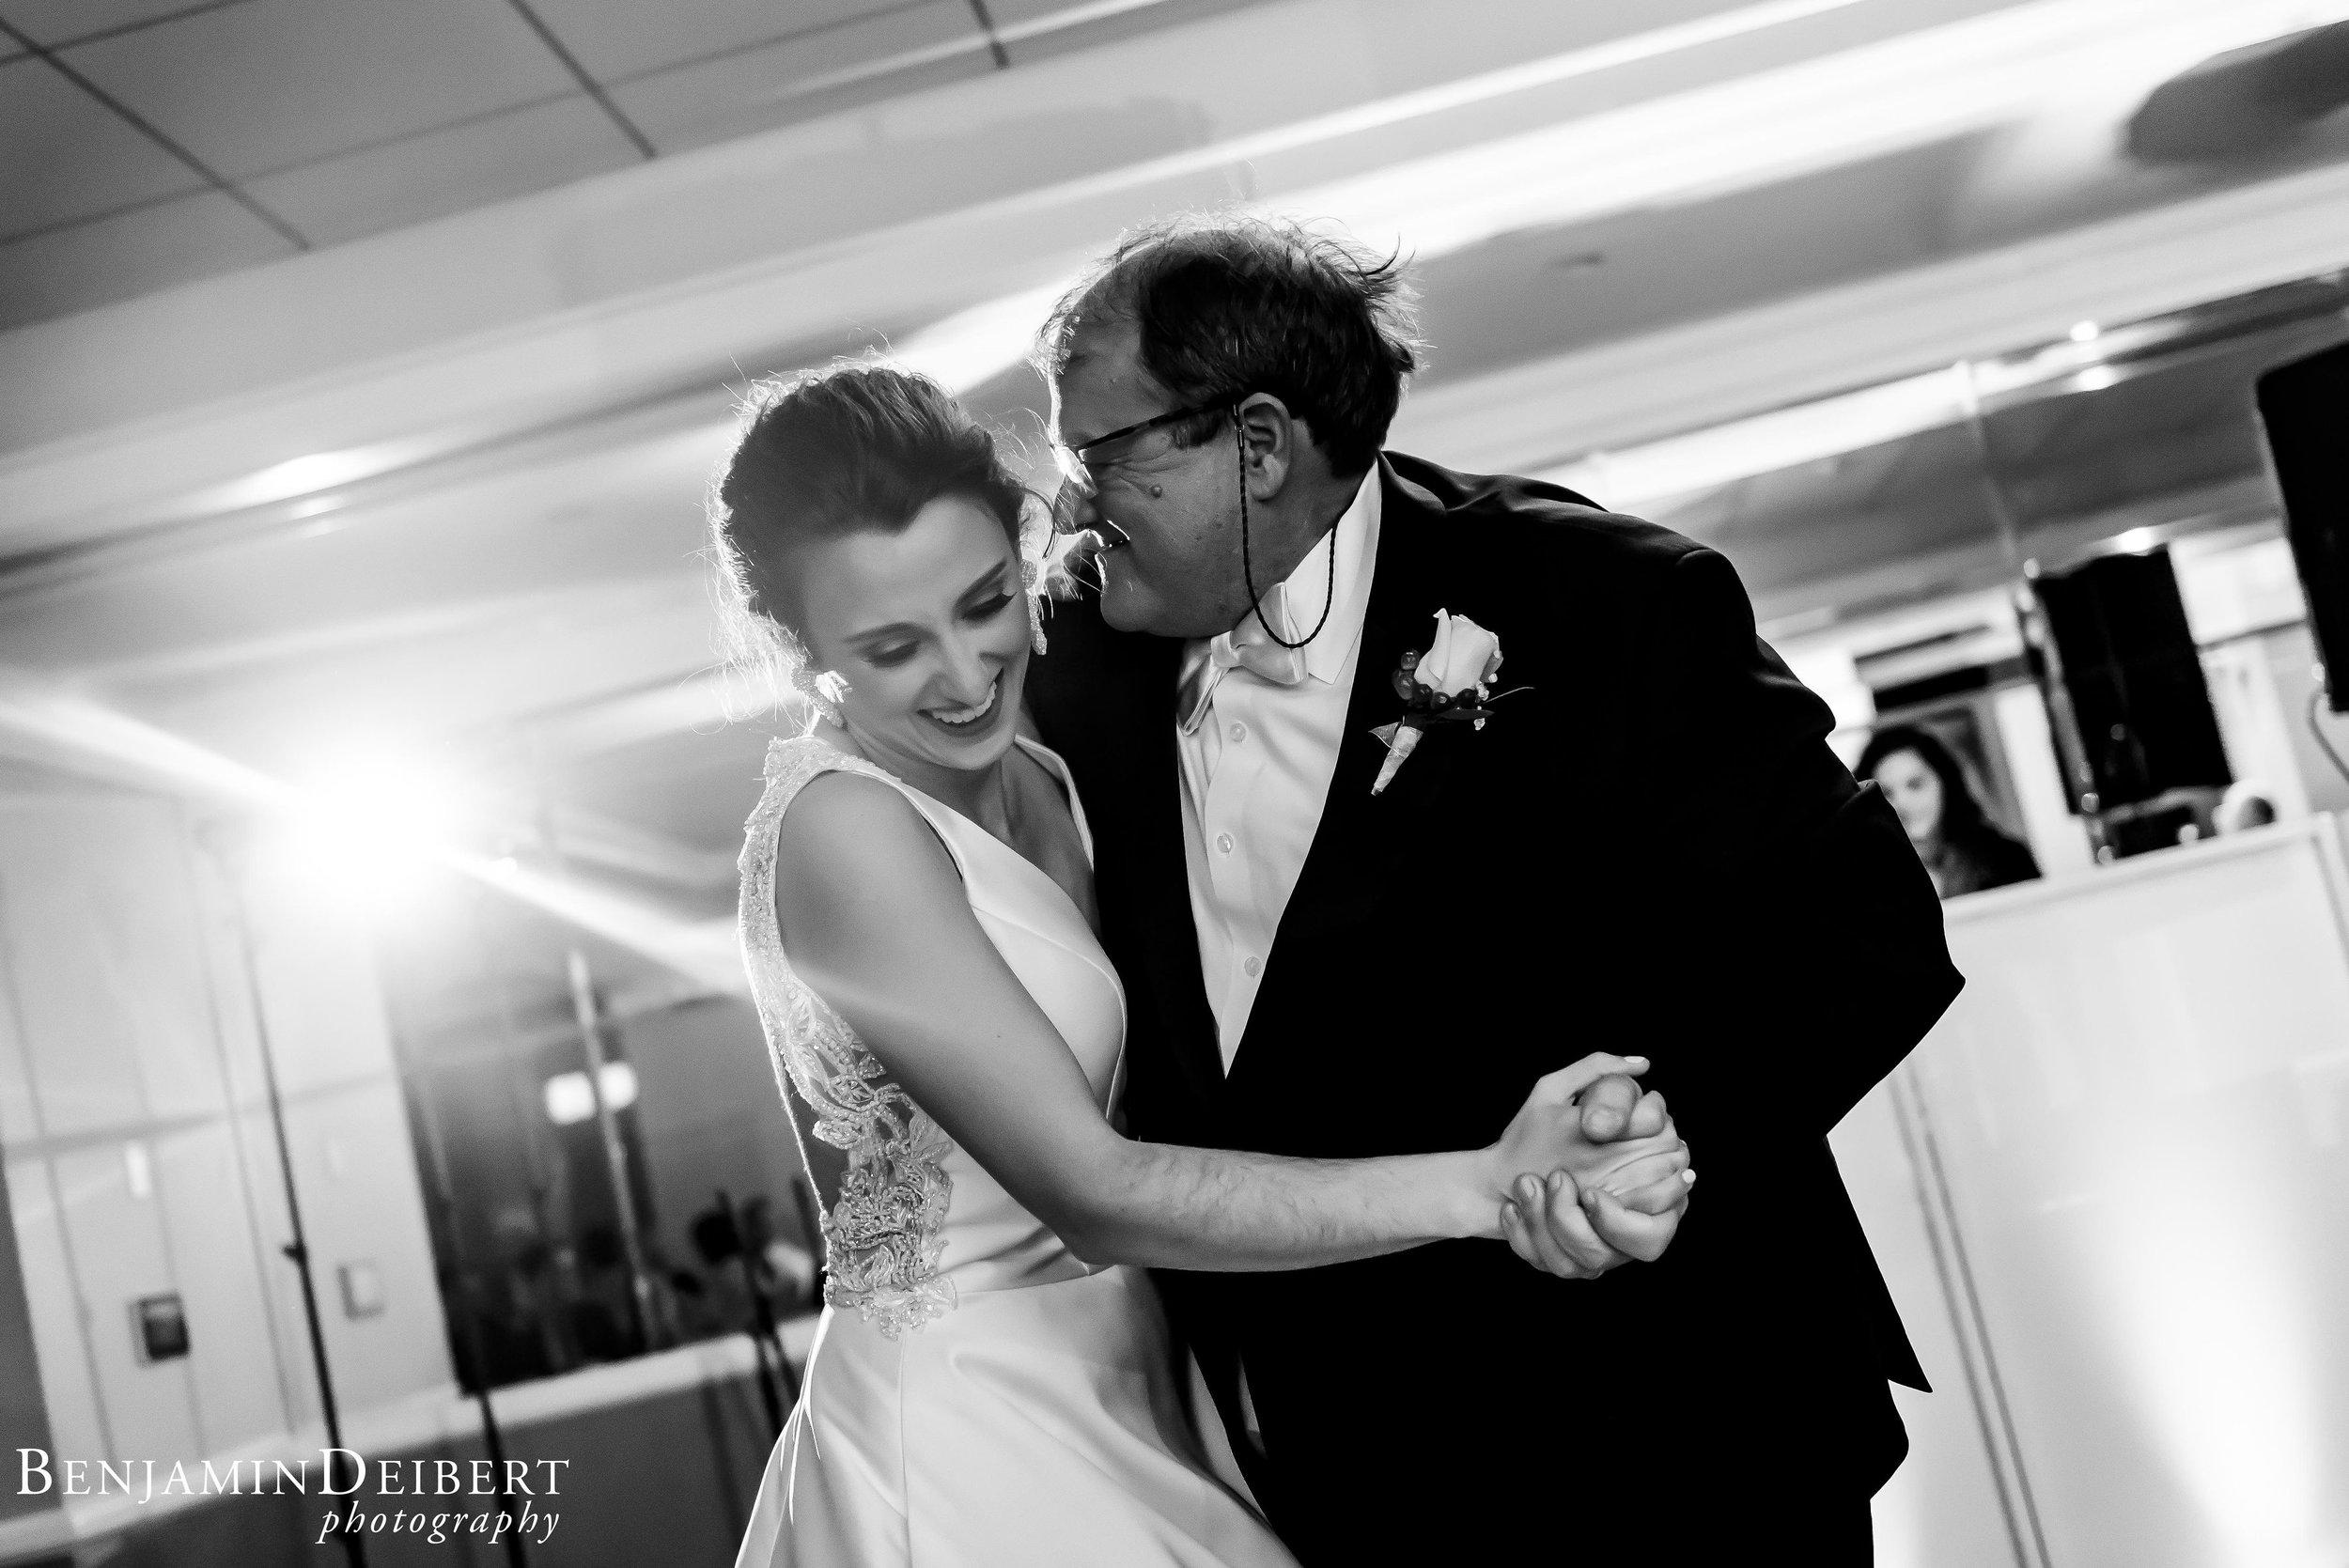 CatherineandDaniel_ThePyramidClub_Wedding-66.jpg